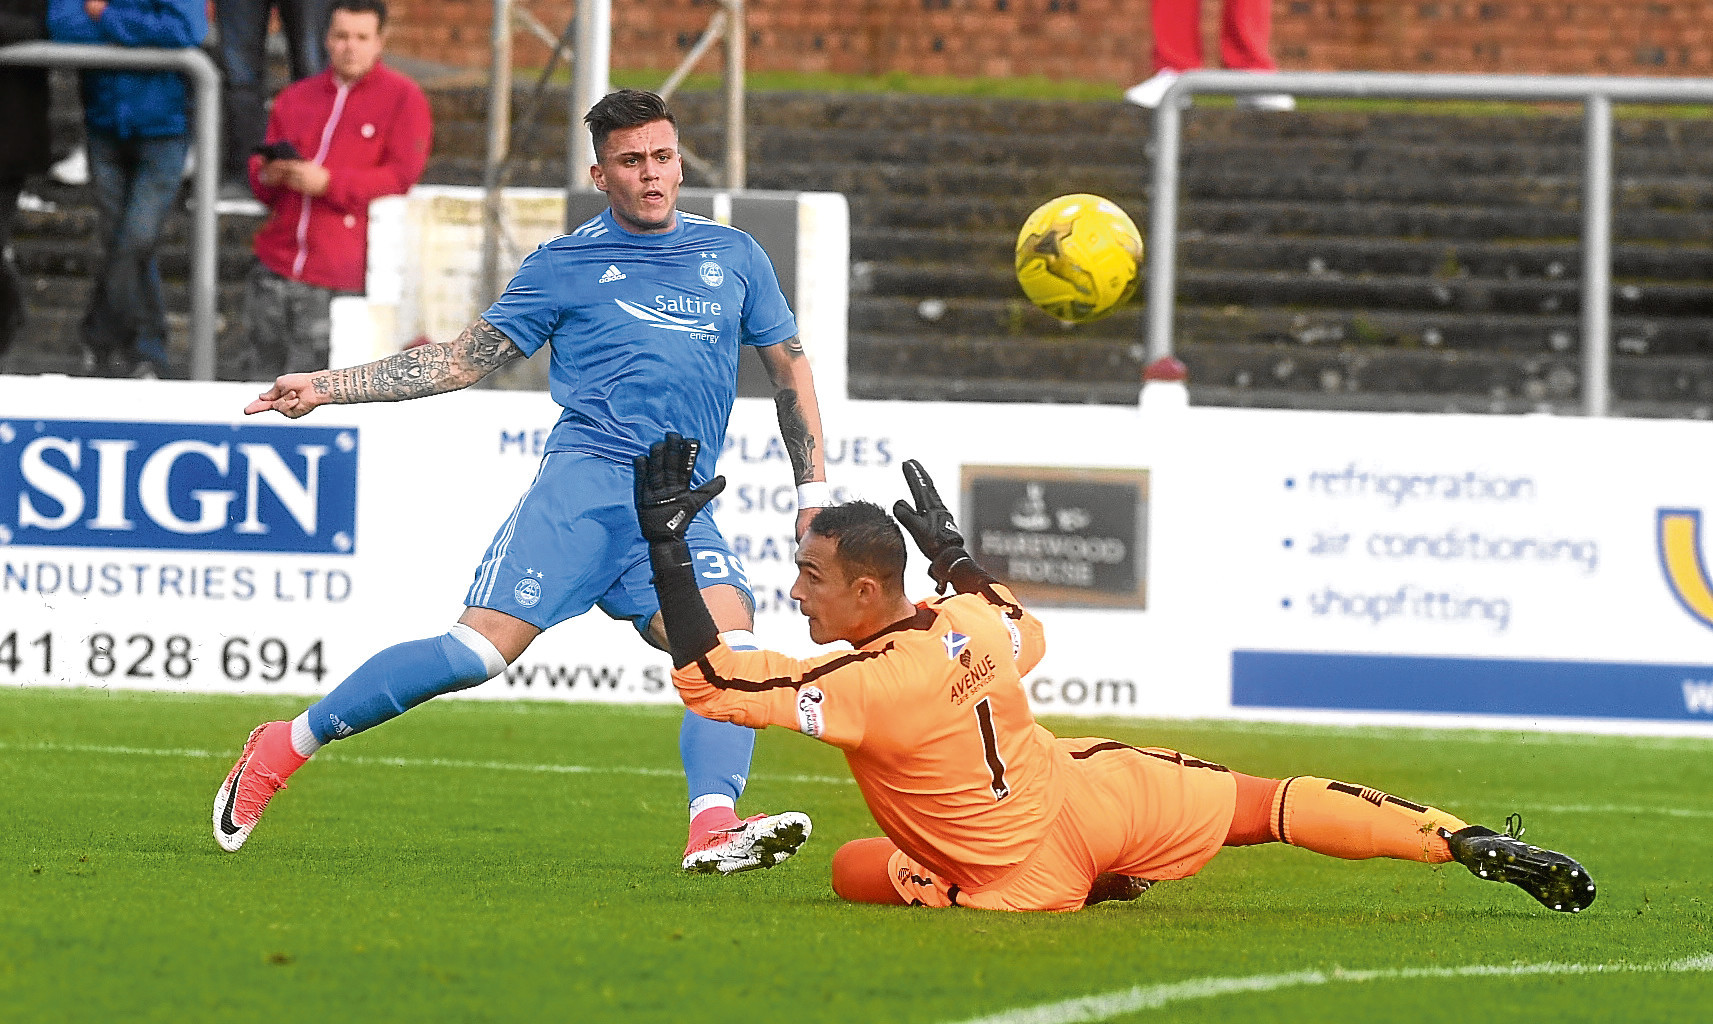 Miles Storey puts an effort wide against Arbroath.